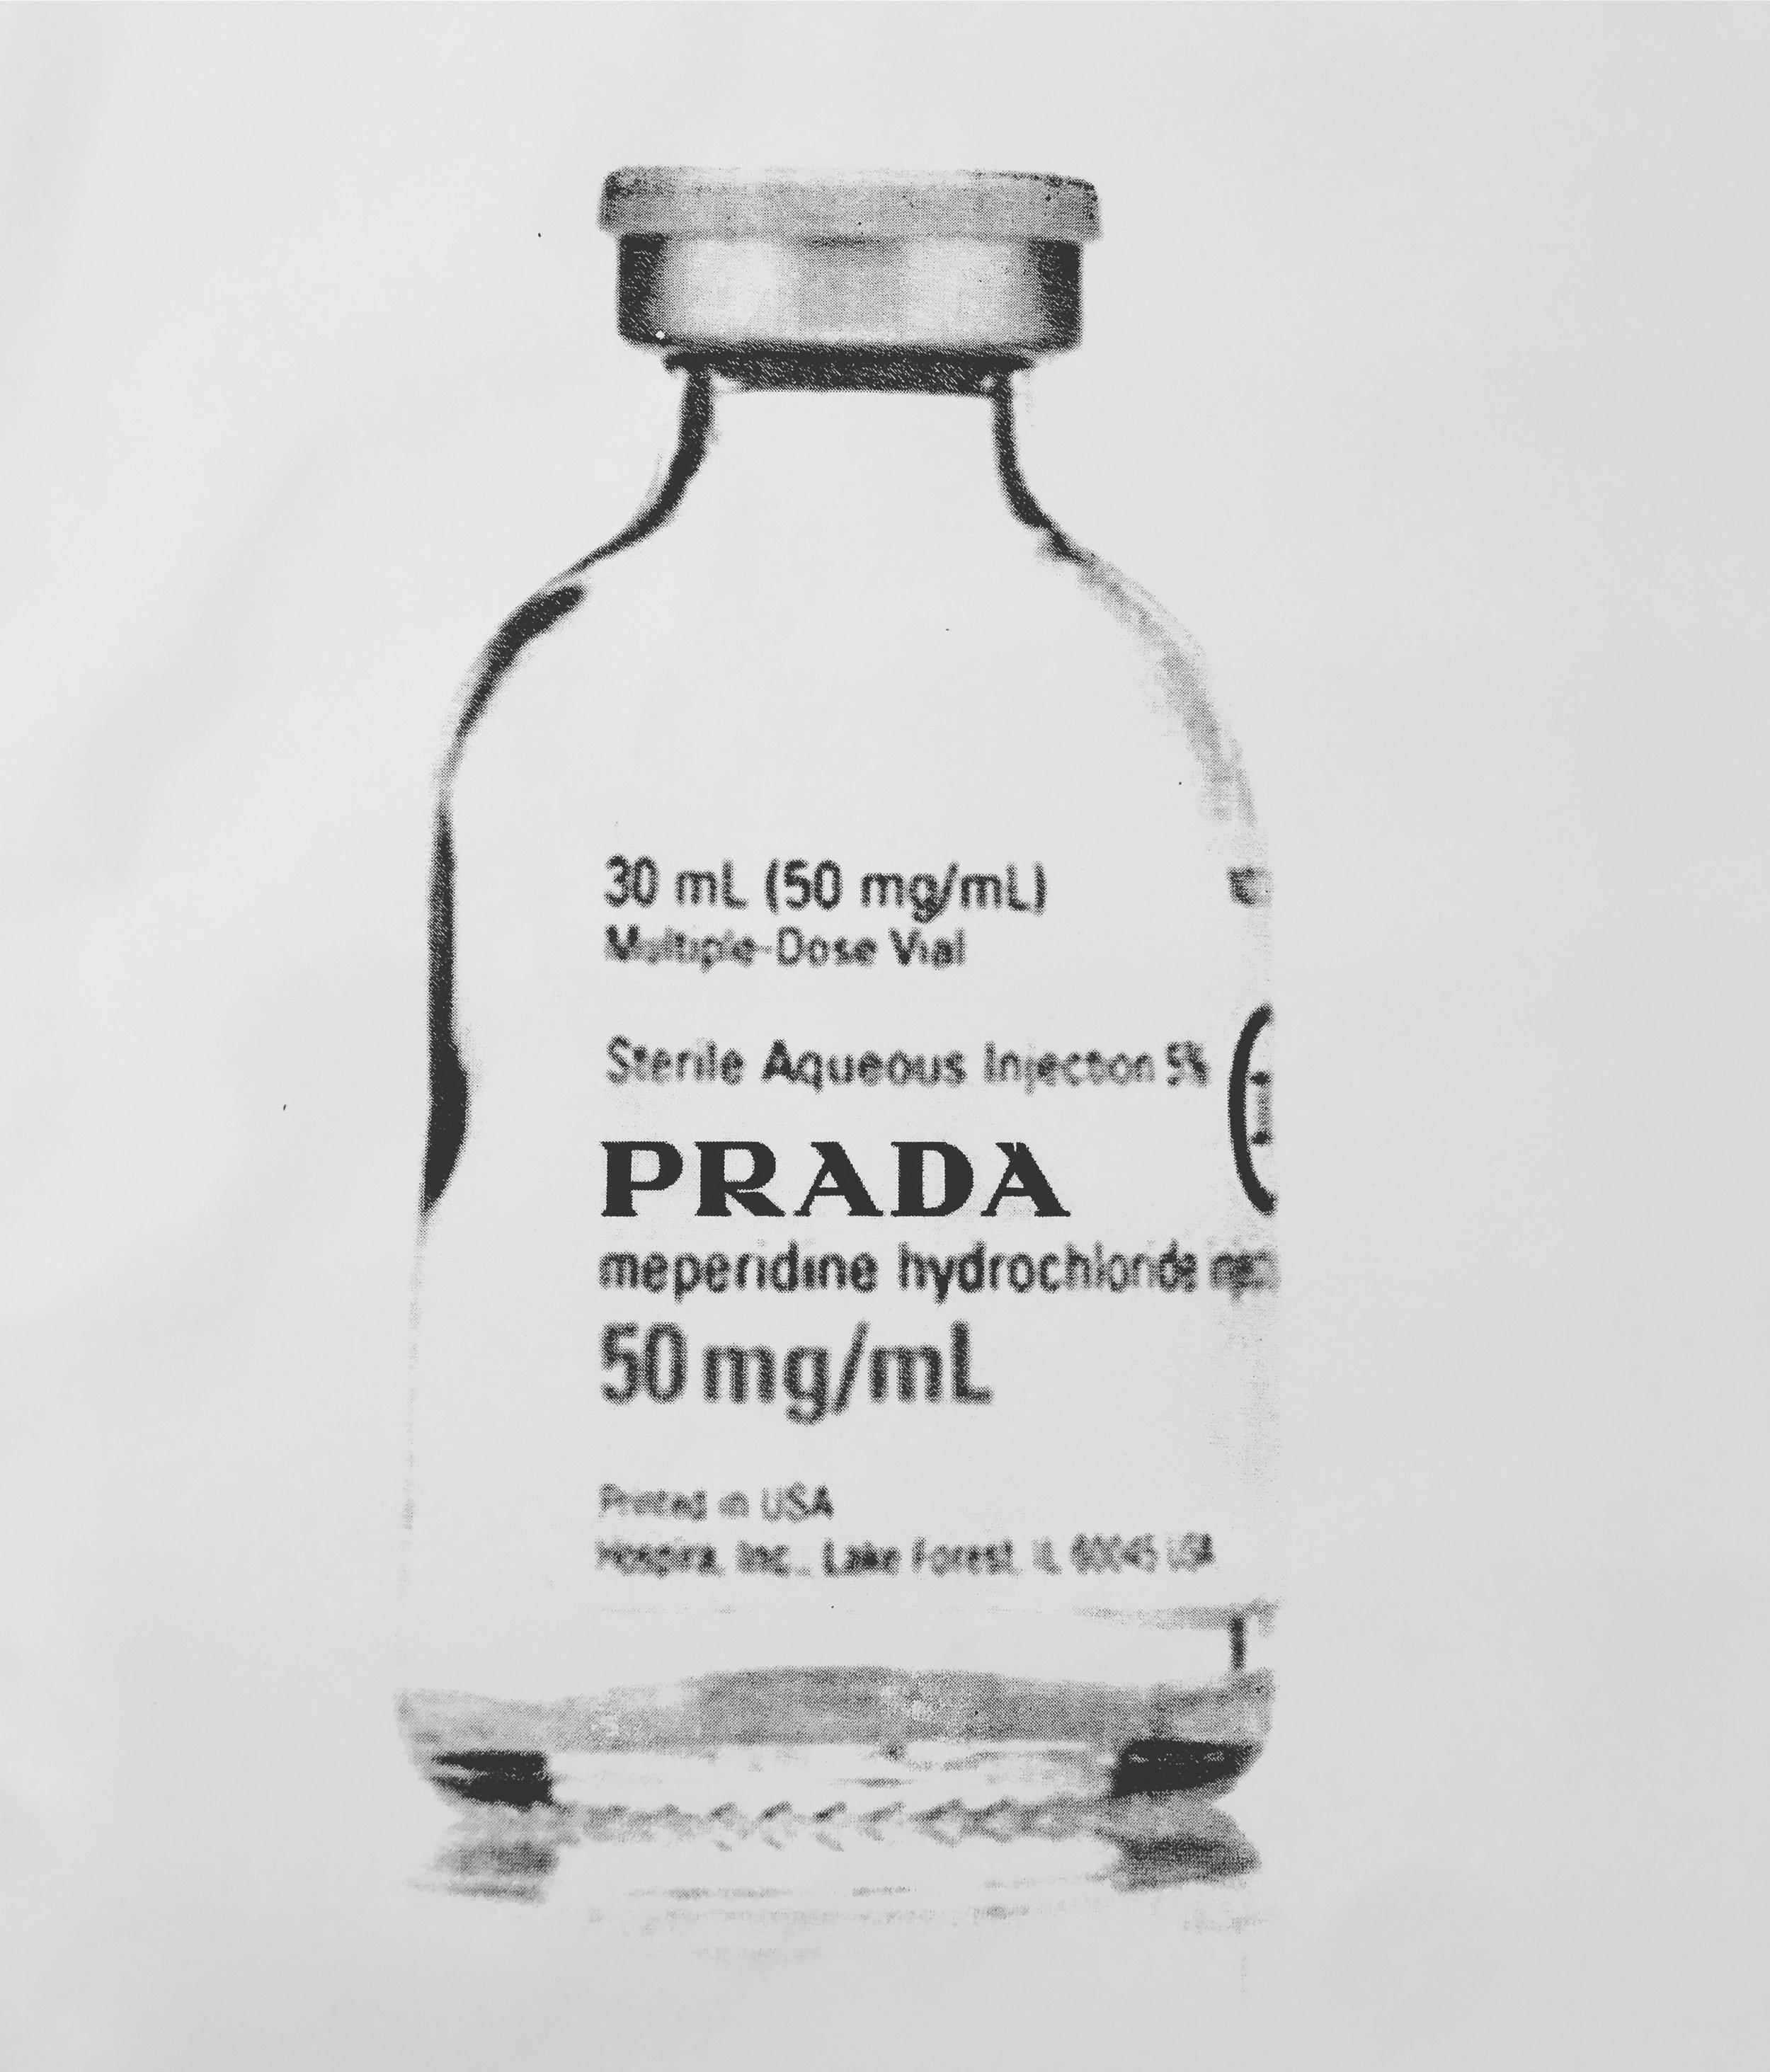 single dose of prada 1-3/3 - 24 x 36 Acrylic on Canvas, Jul '17OLIVER COLE GALLERY